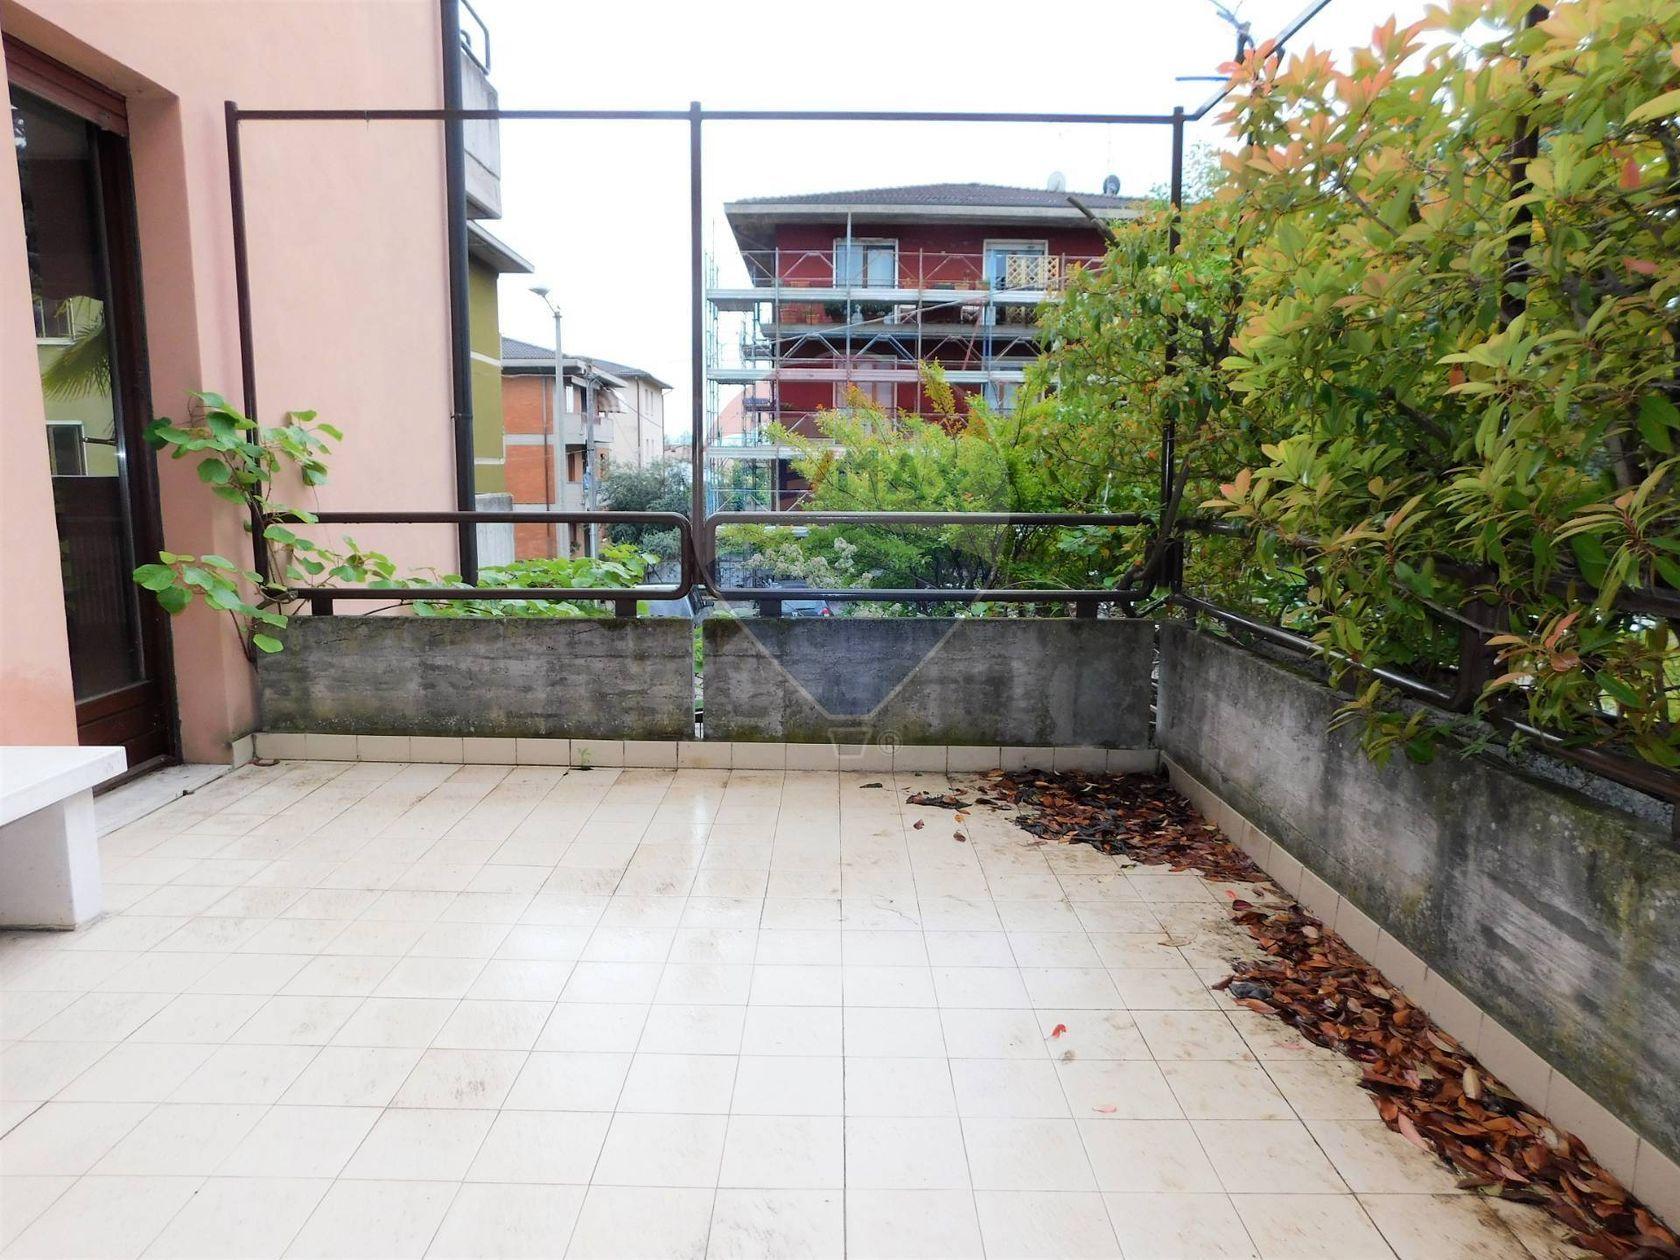 Casa Indipendente Quinzano, Verona, VR Vendita - Foto 7